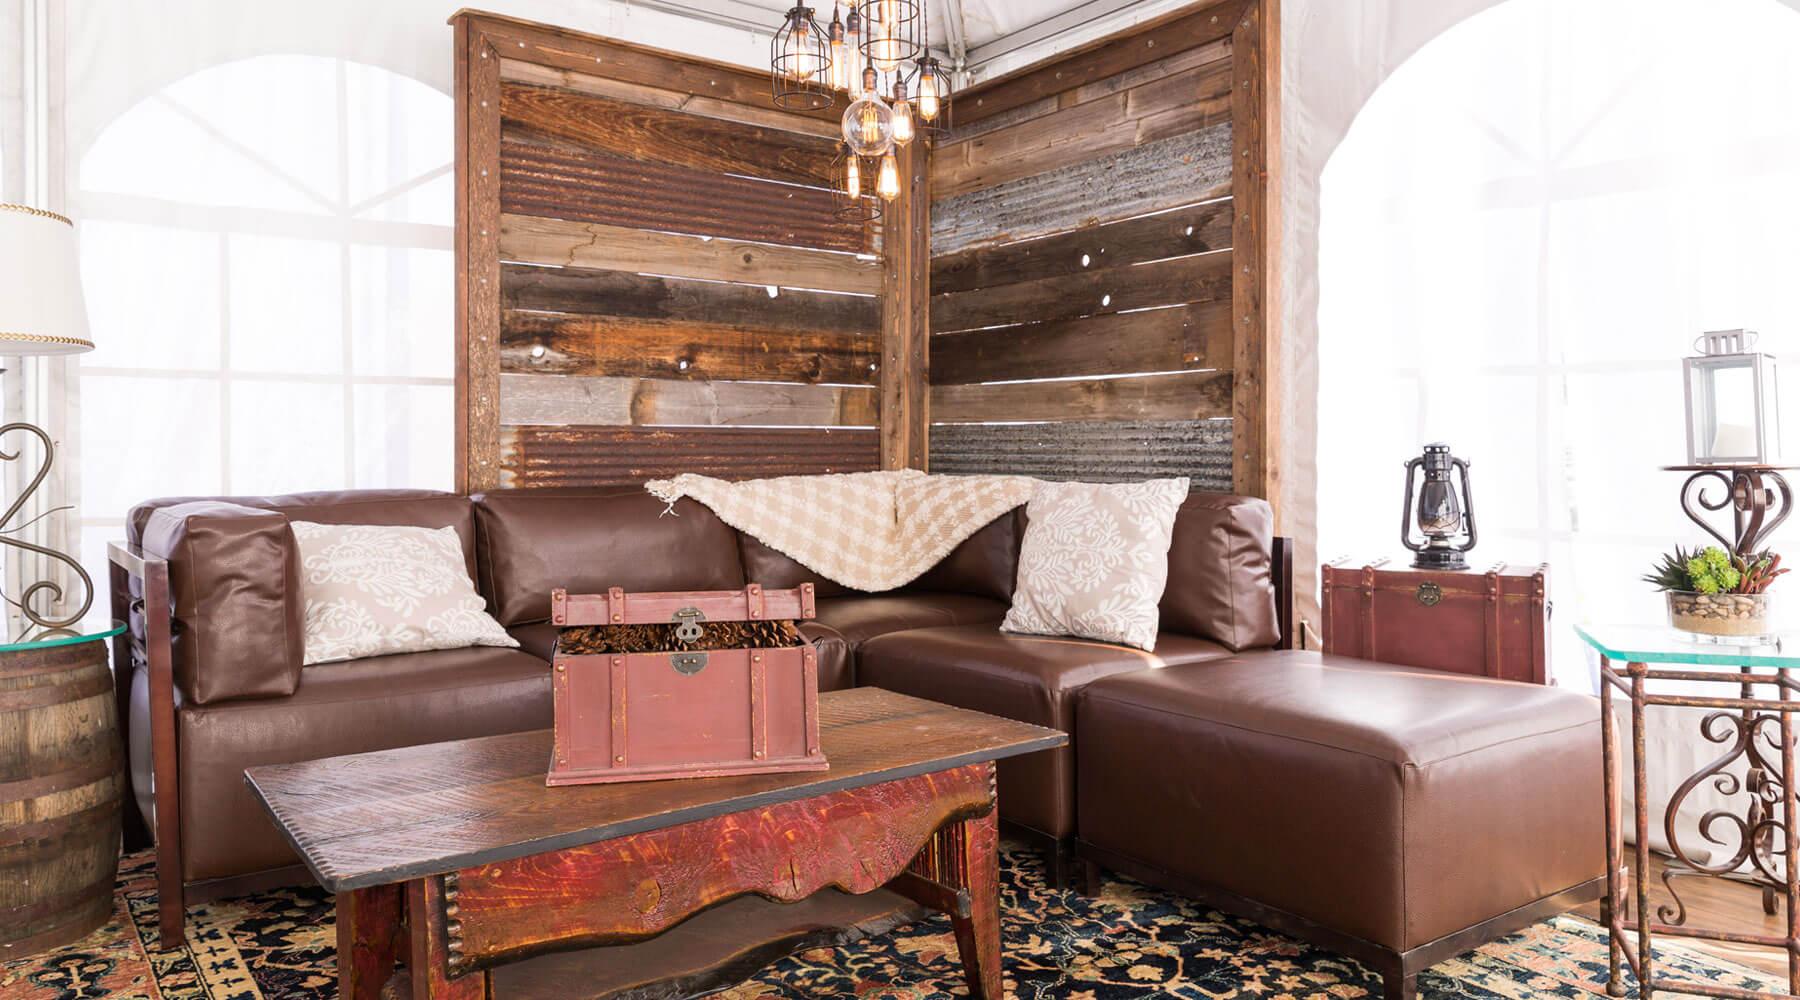 Rustic Decor Rentals. Lounge Furniture Rental